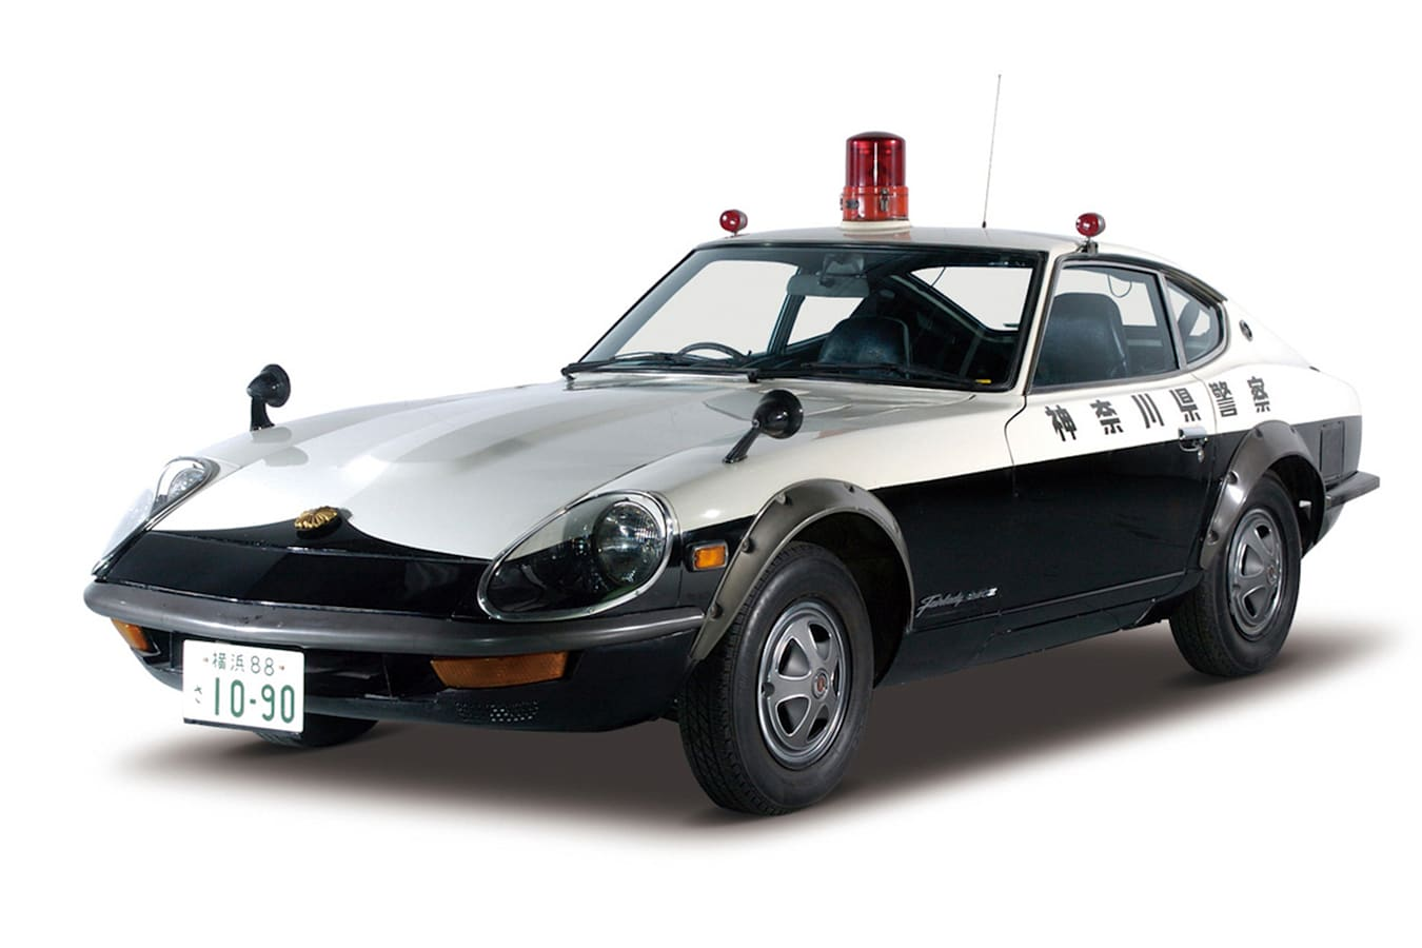 Nissan Fairlady 240Z police